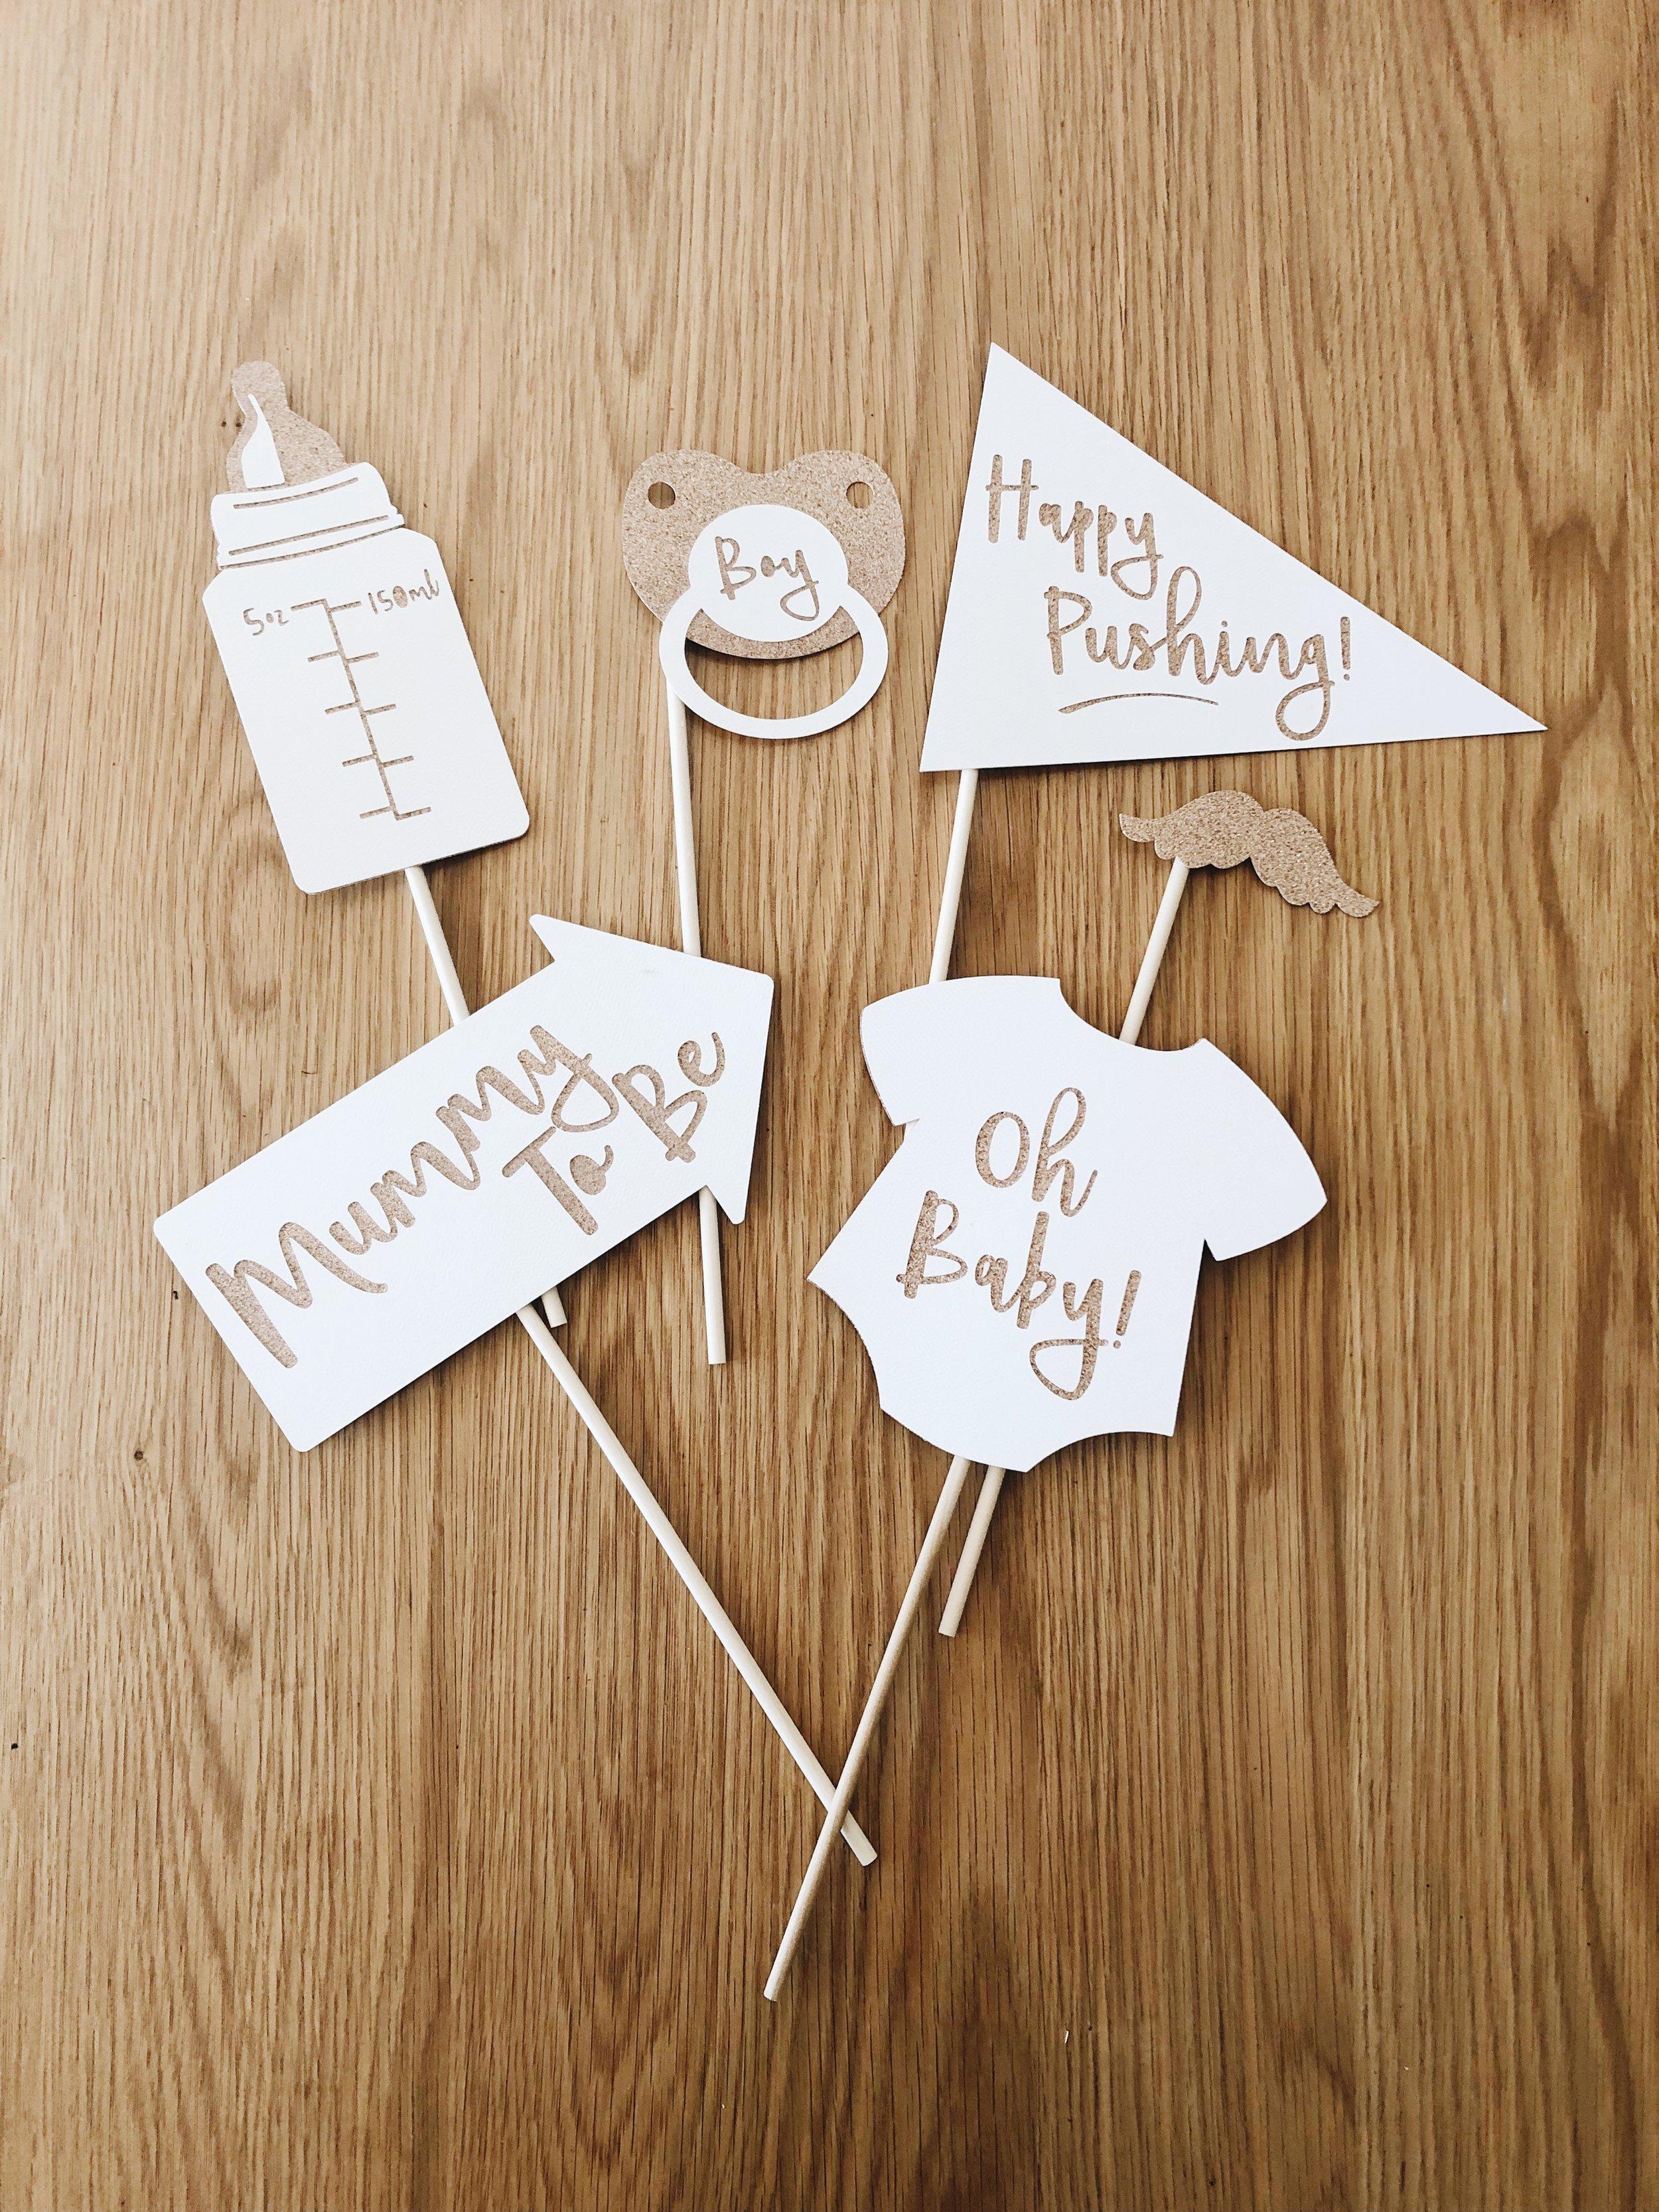 Card prop on sticks